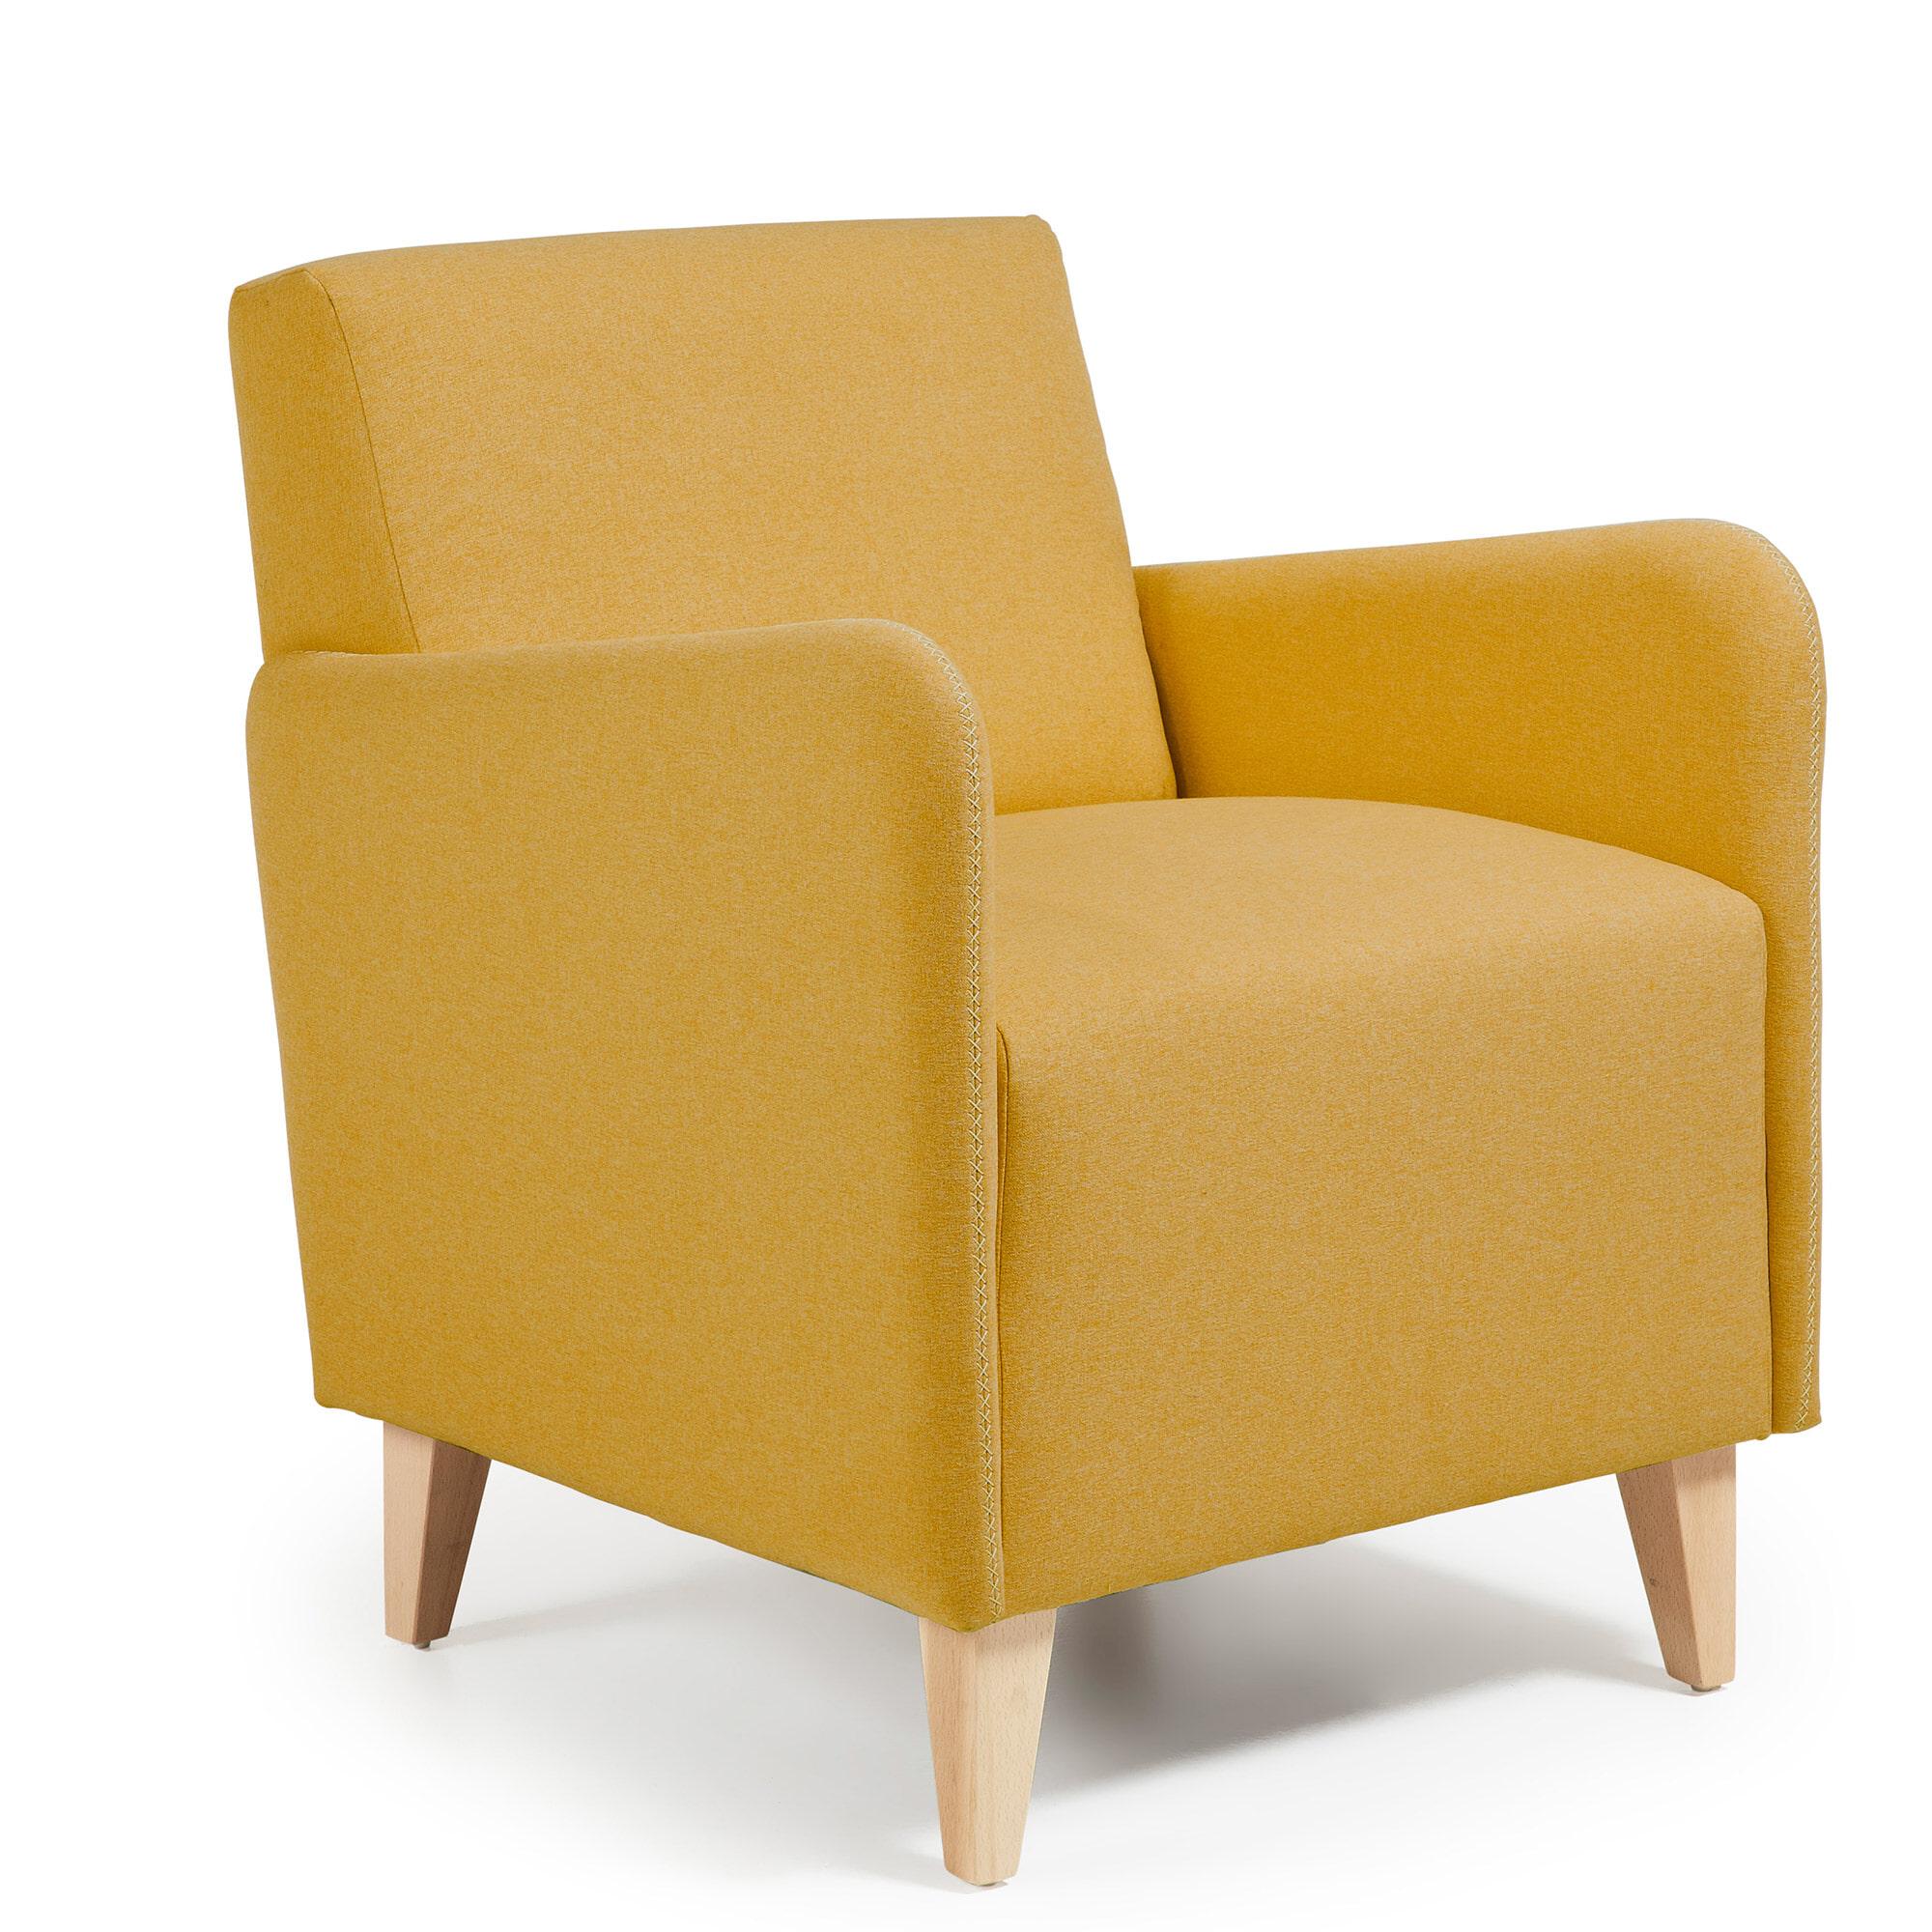 Kave Home Fauteuil 'Arck' kleur geel